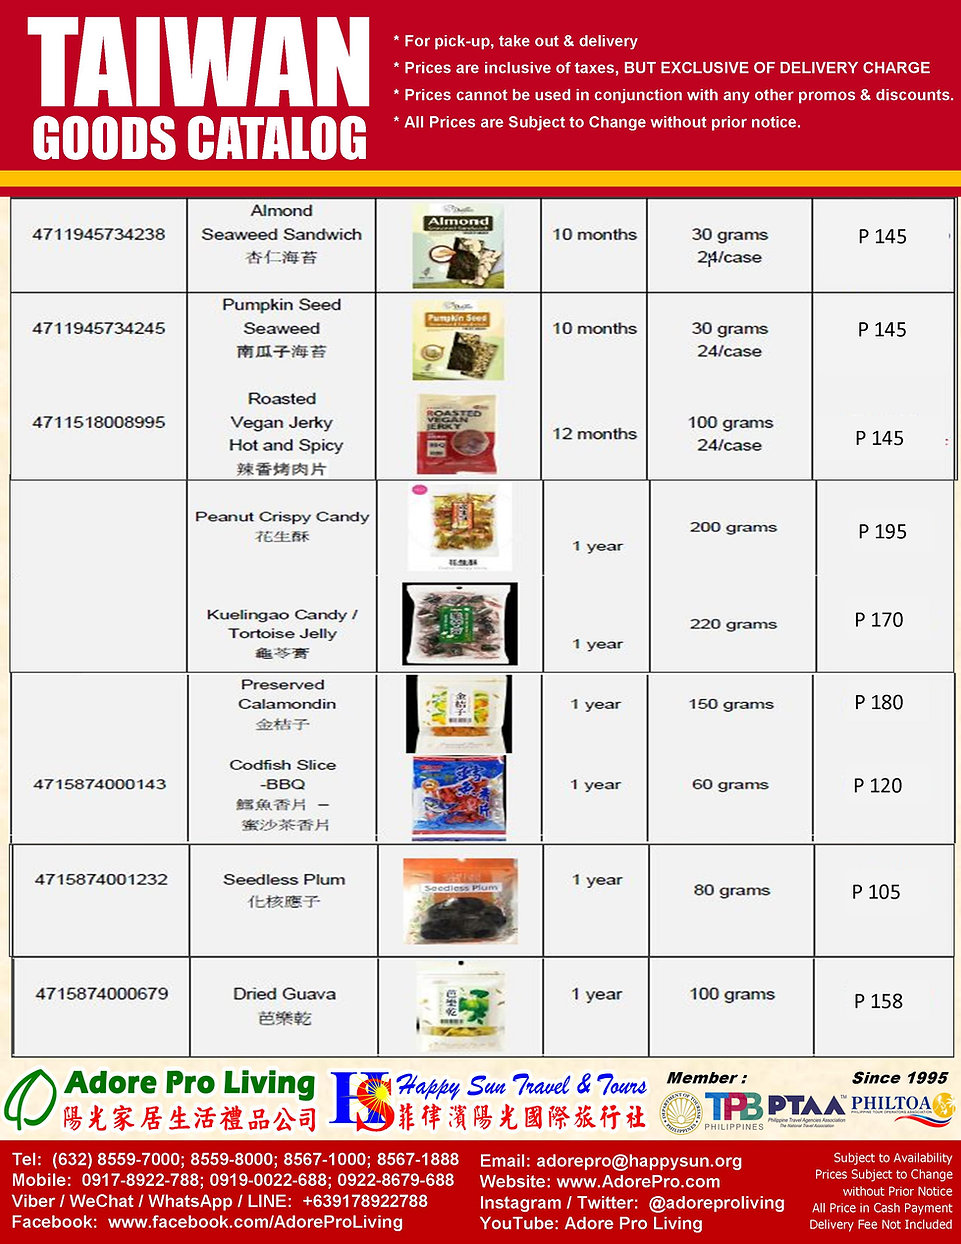 P8_Taiwan Goods Catalog_202009119.jpg